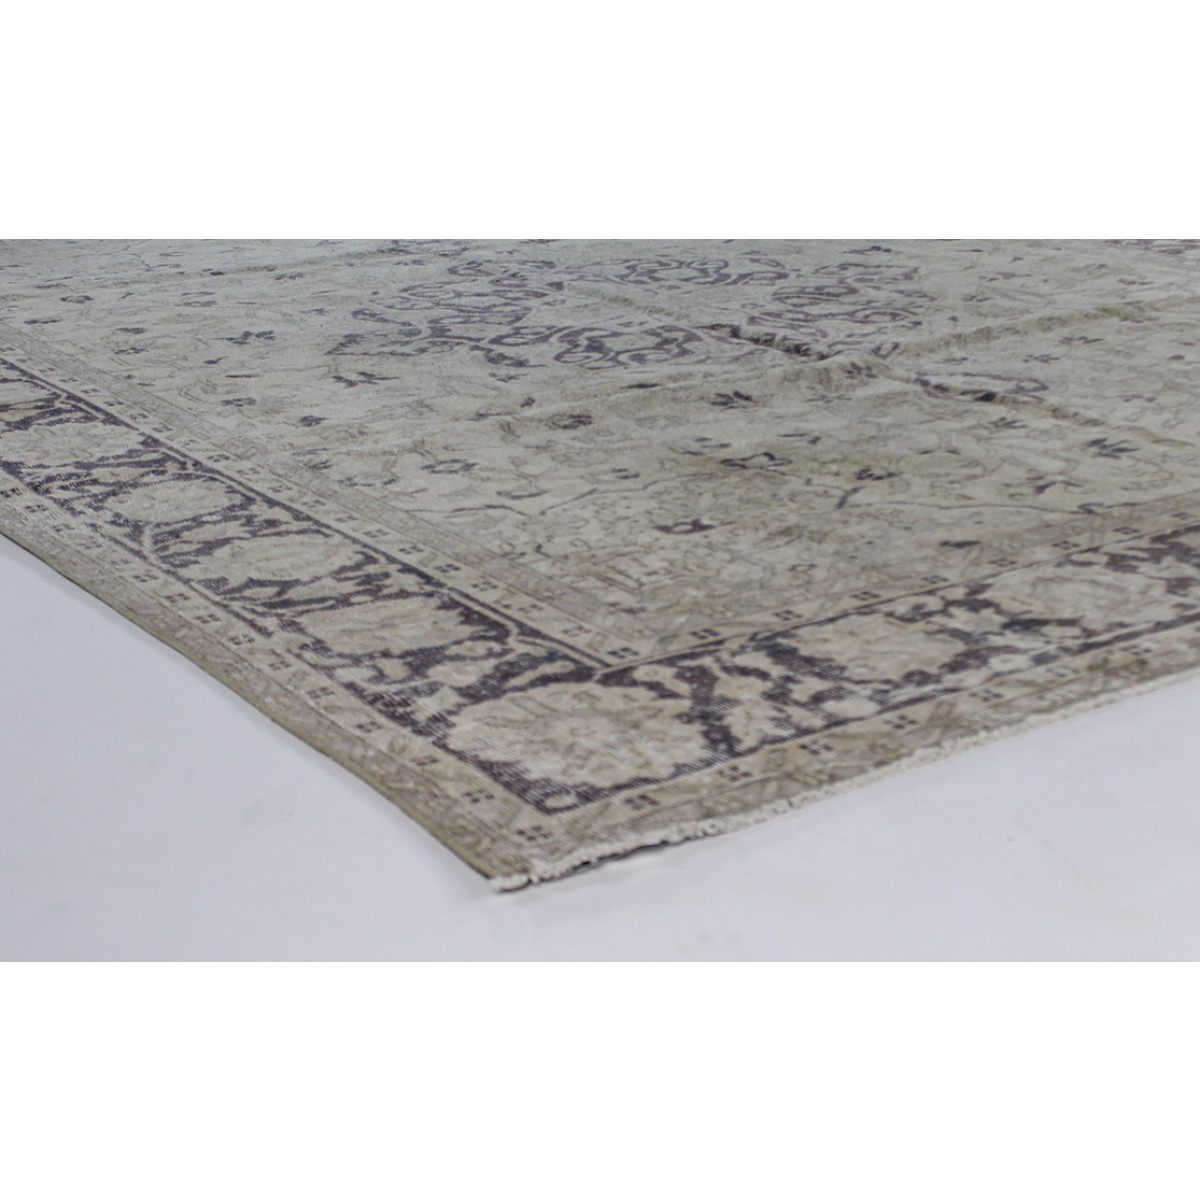 28 Stylish Rug Pads for Hardwood Floors 2021 free download rug pads for hardwood floors of overdye for more views